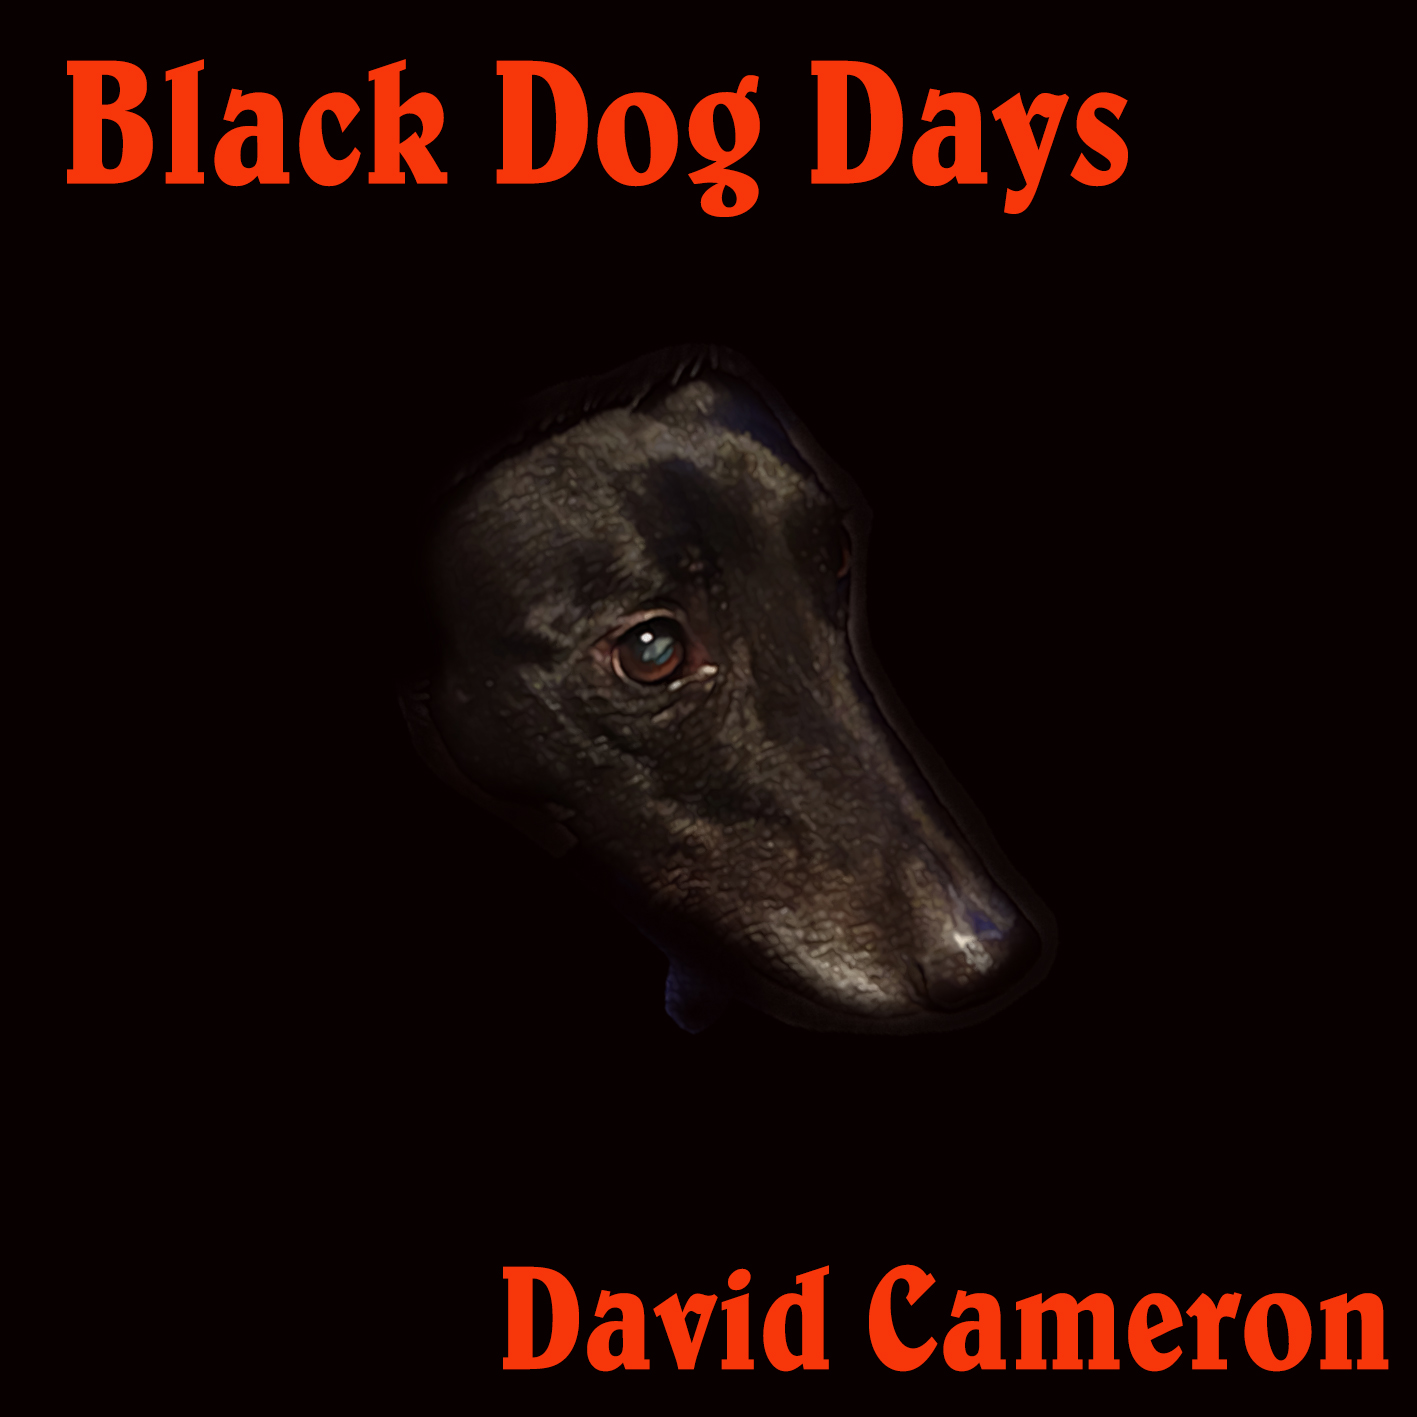 Black Dog Days Case cover 1